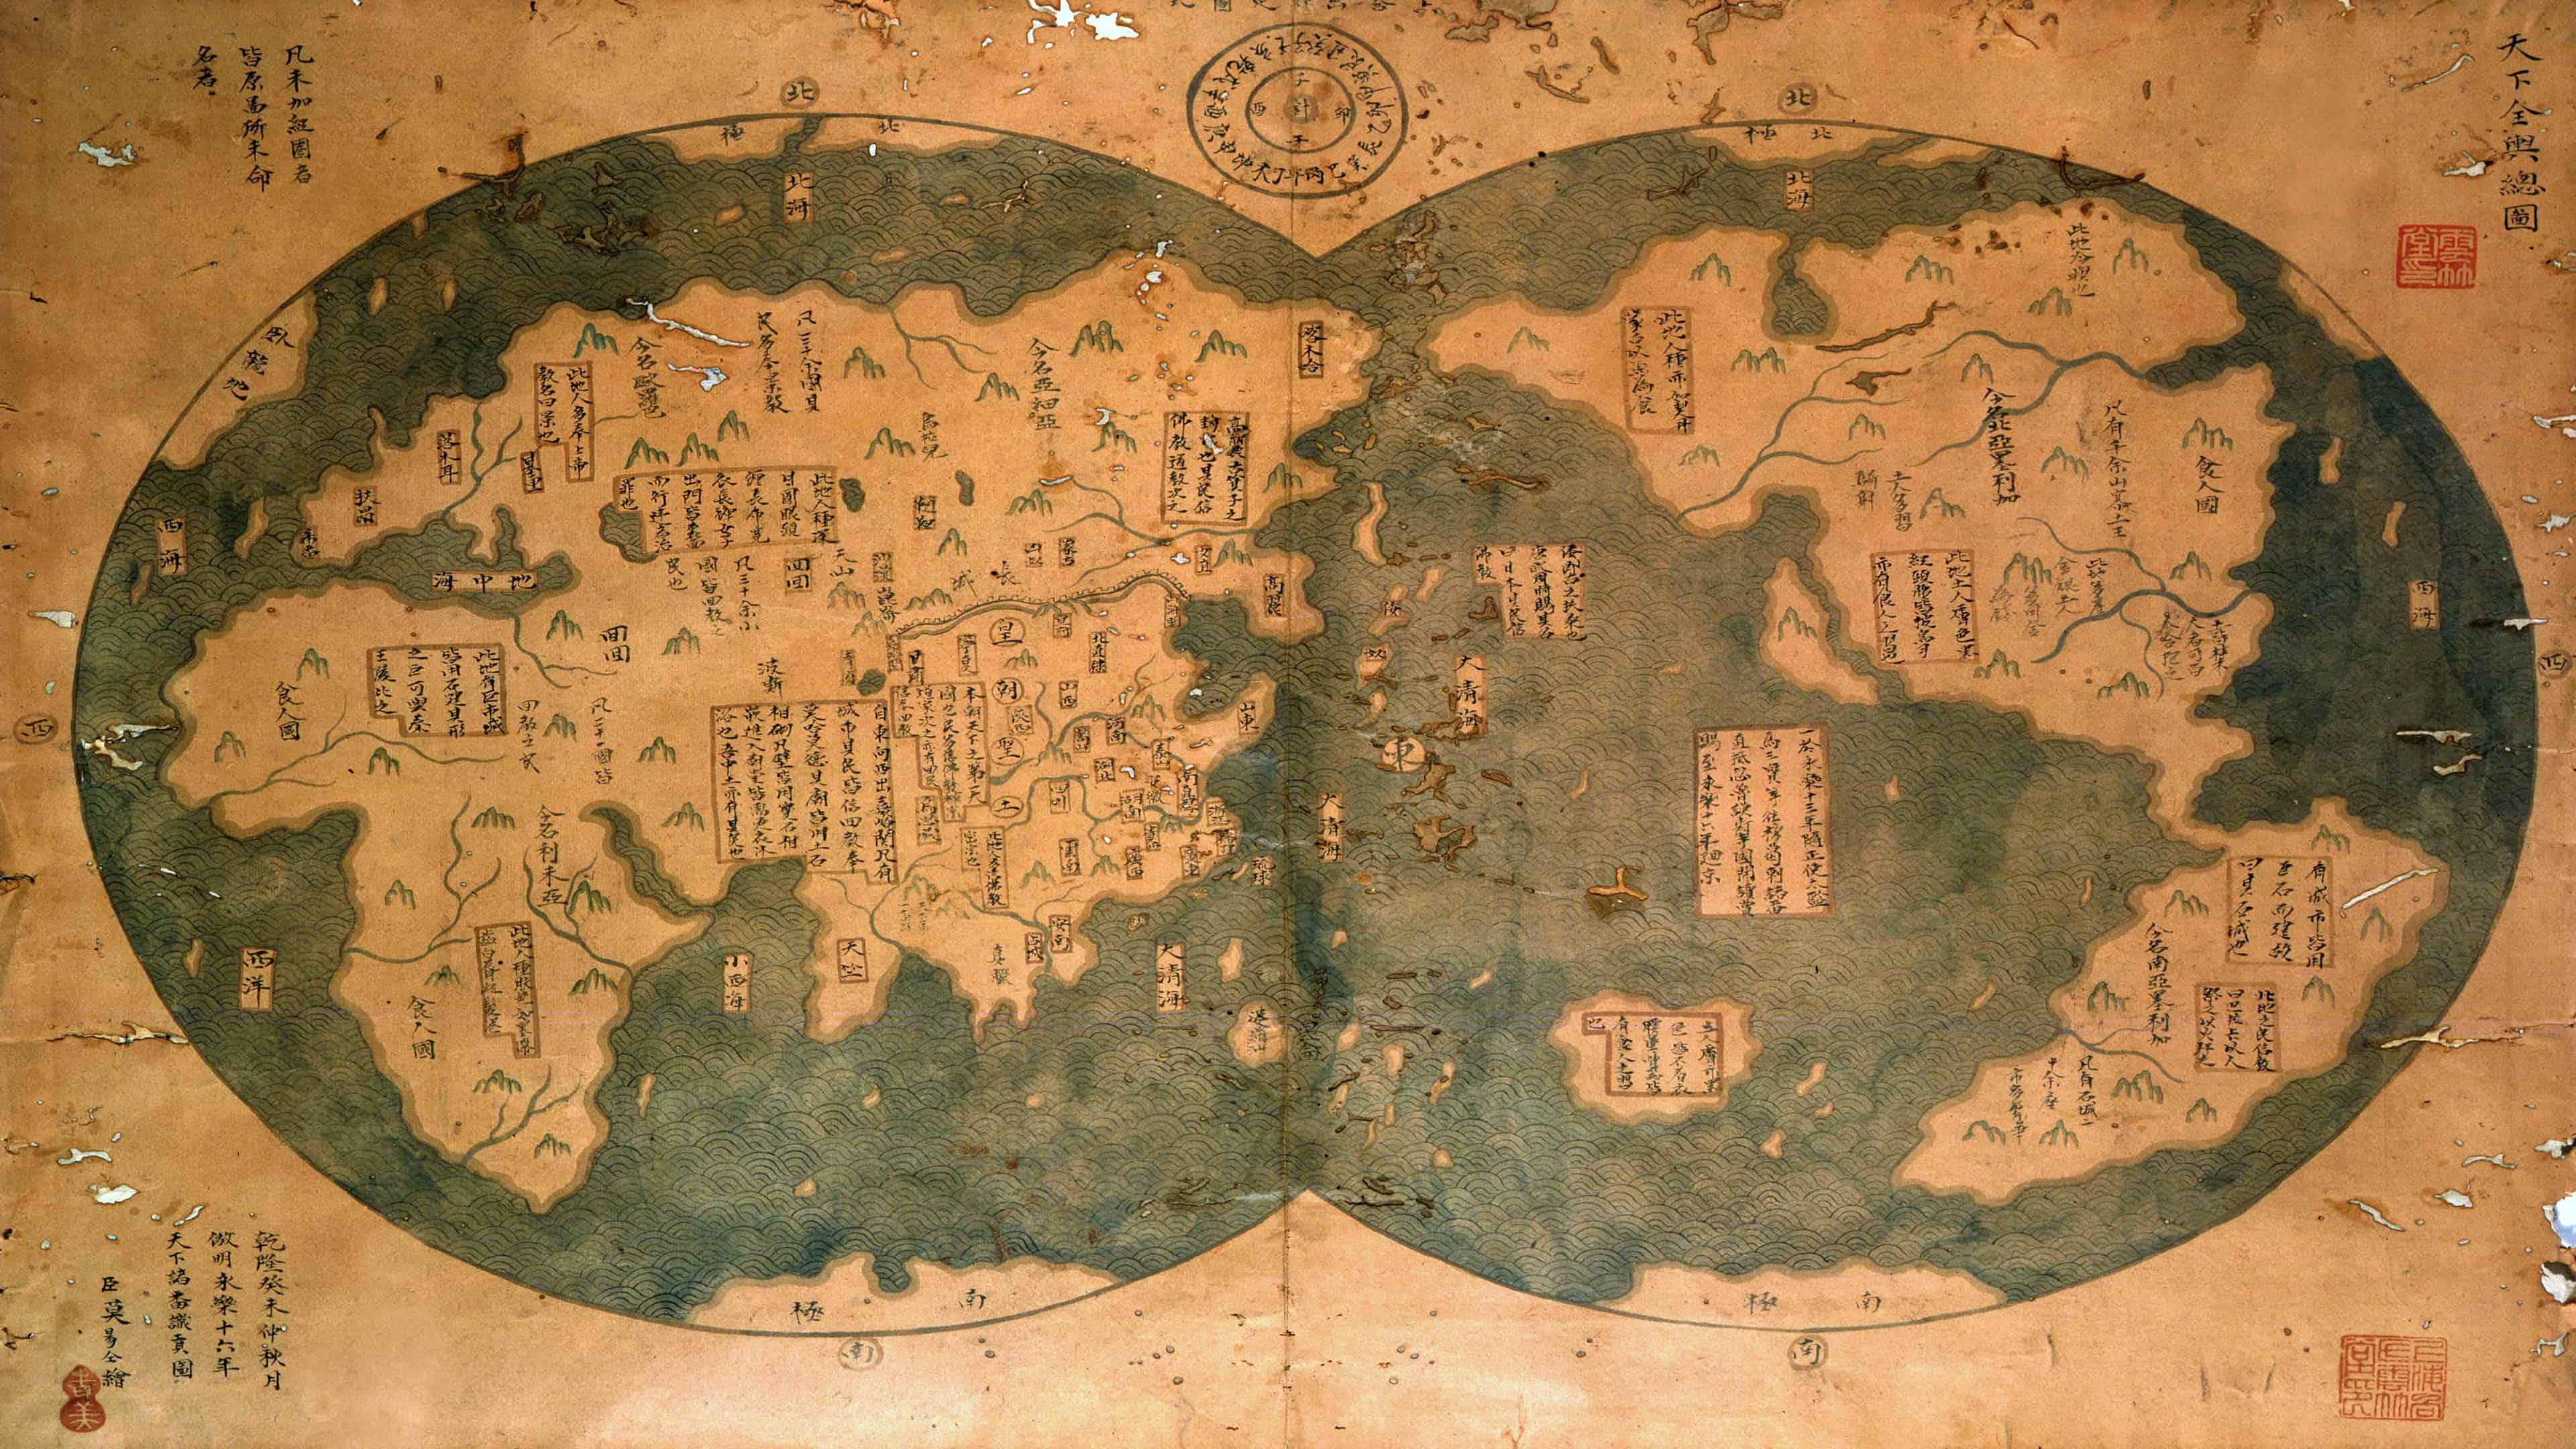 Free Download Chinese Vintage World Map Zheng He Uhd 4k Wallpaper